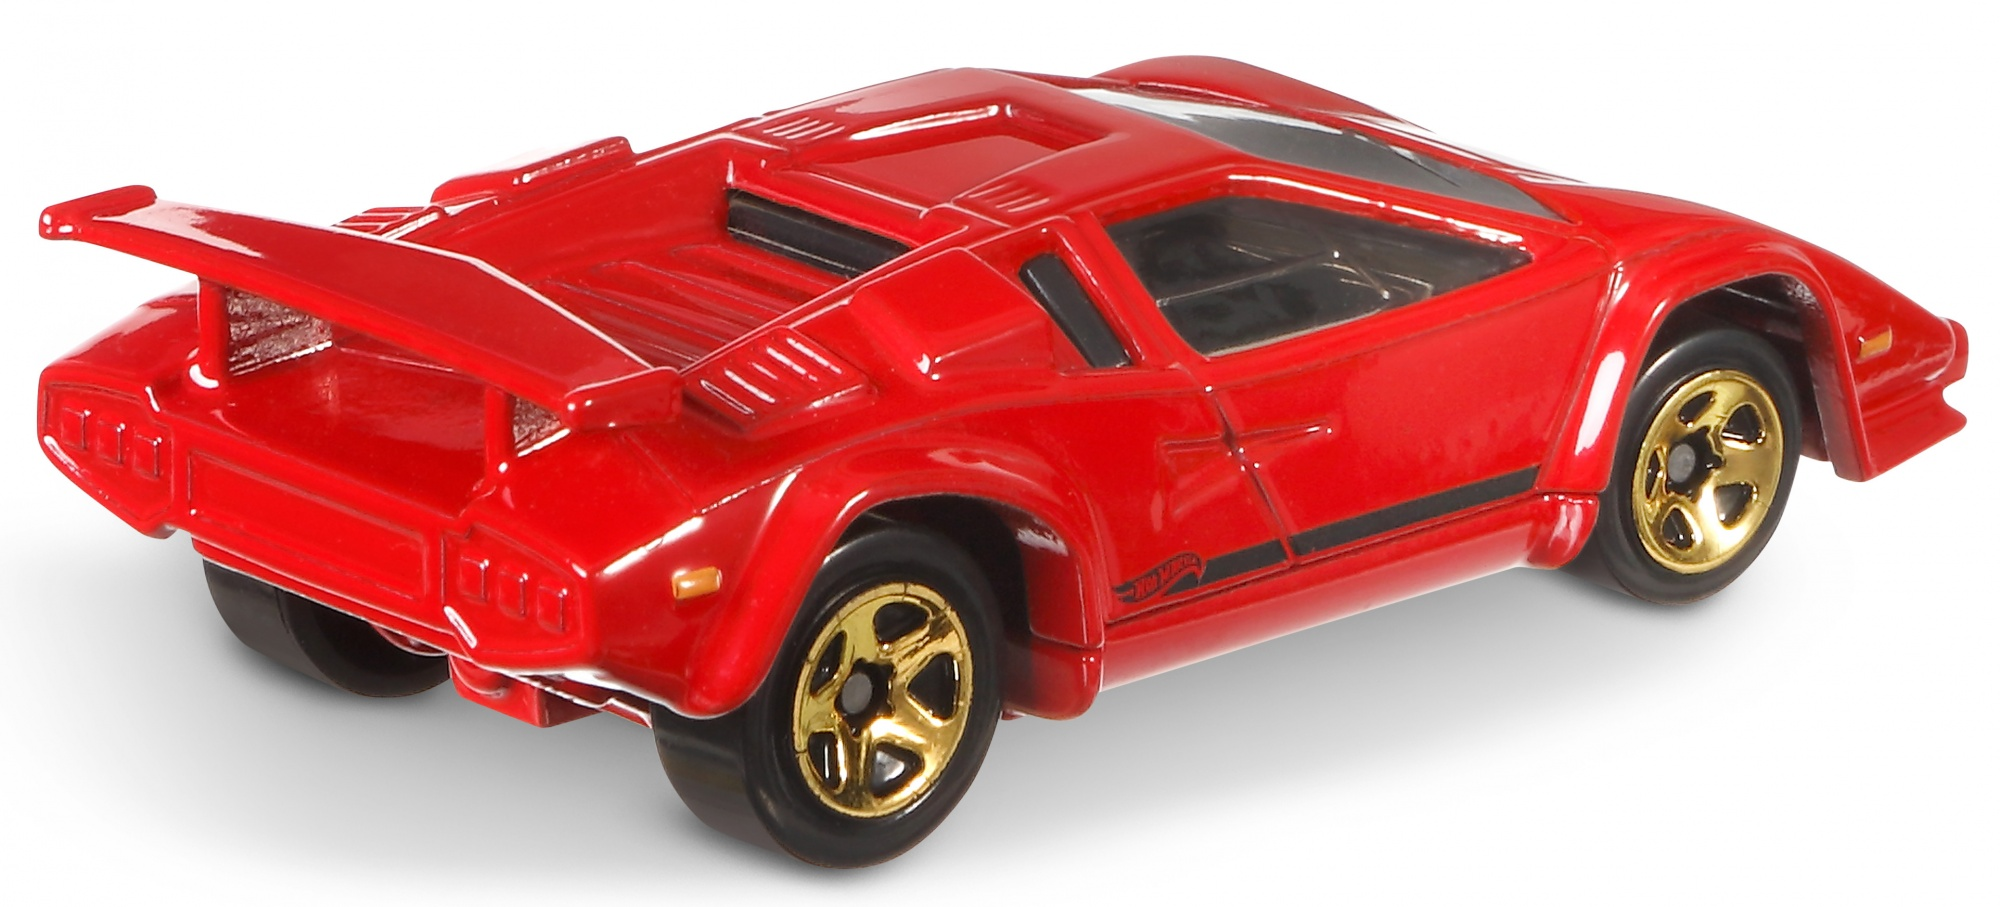 Hot Wheels Sports Car Lamborghini Countach Red 7 Cm